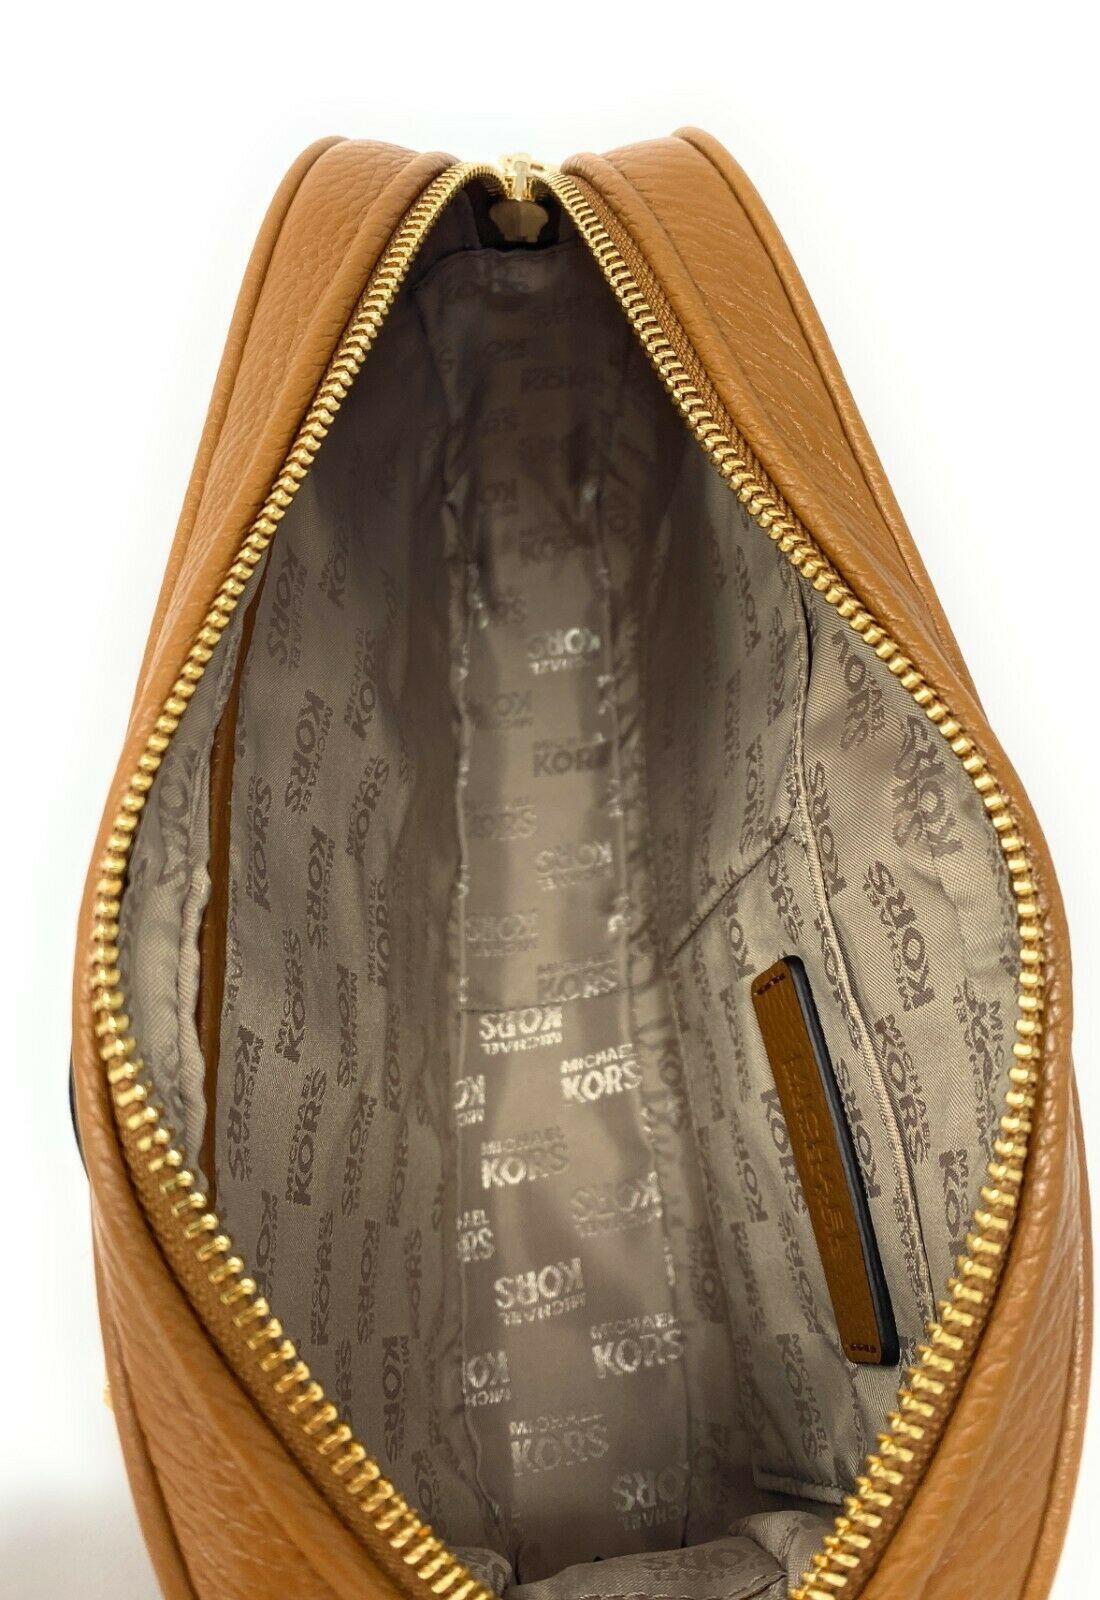 thumbnail 67 - Michael Kors Jet Set Item Large East West Crossbody Chain Handbag Clutch $298